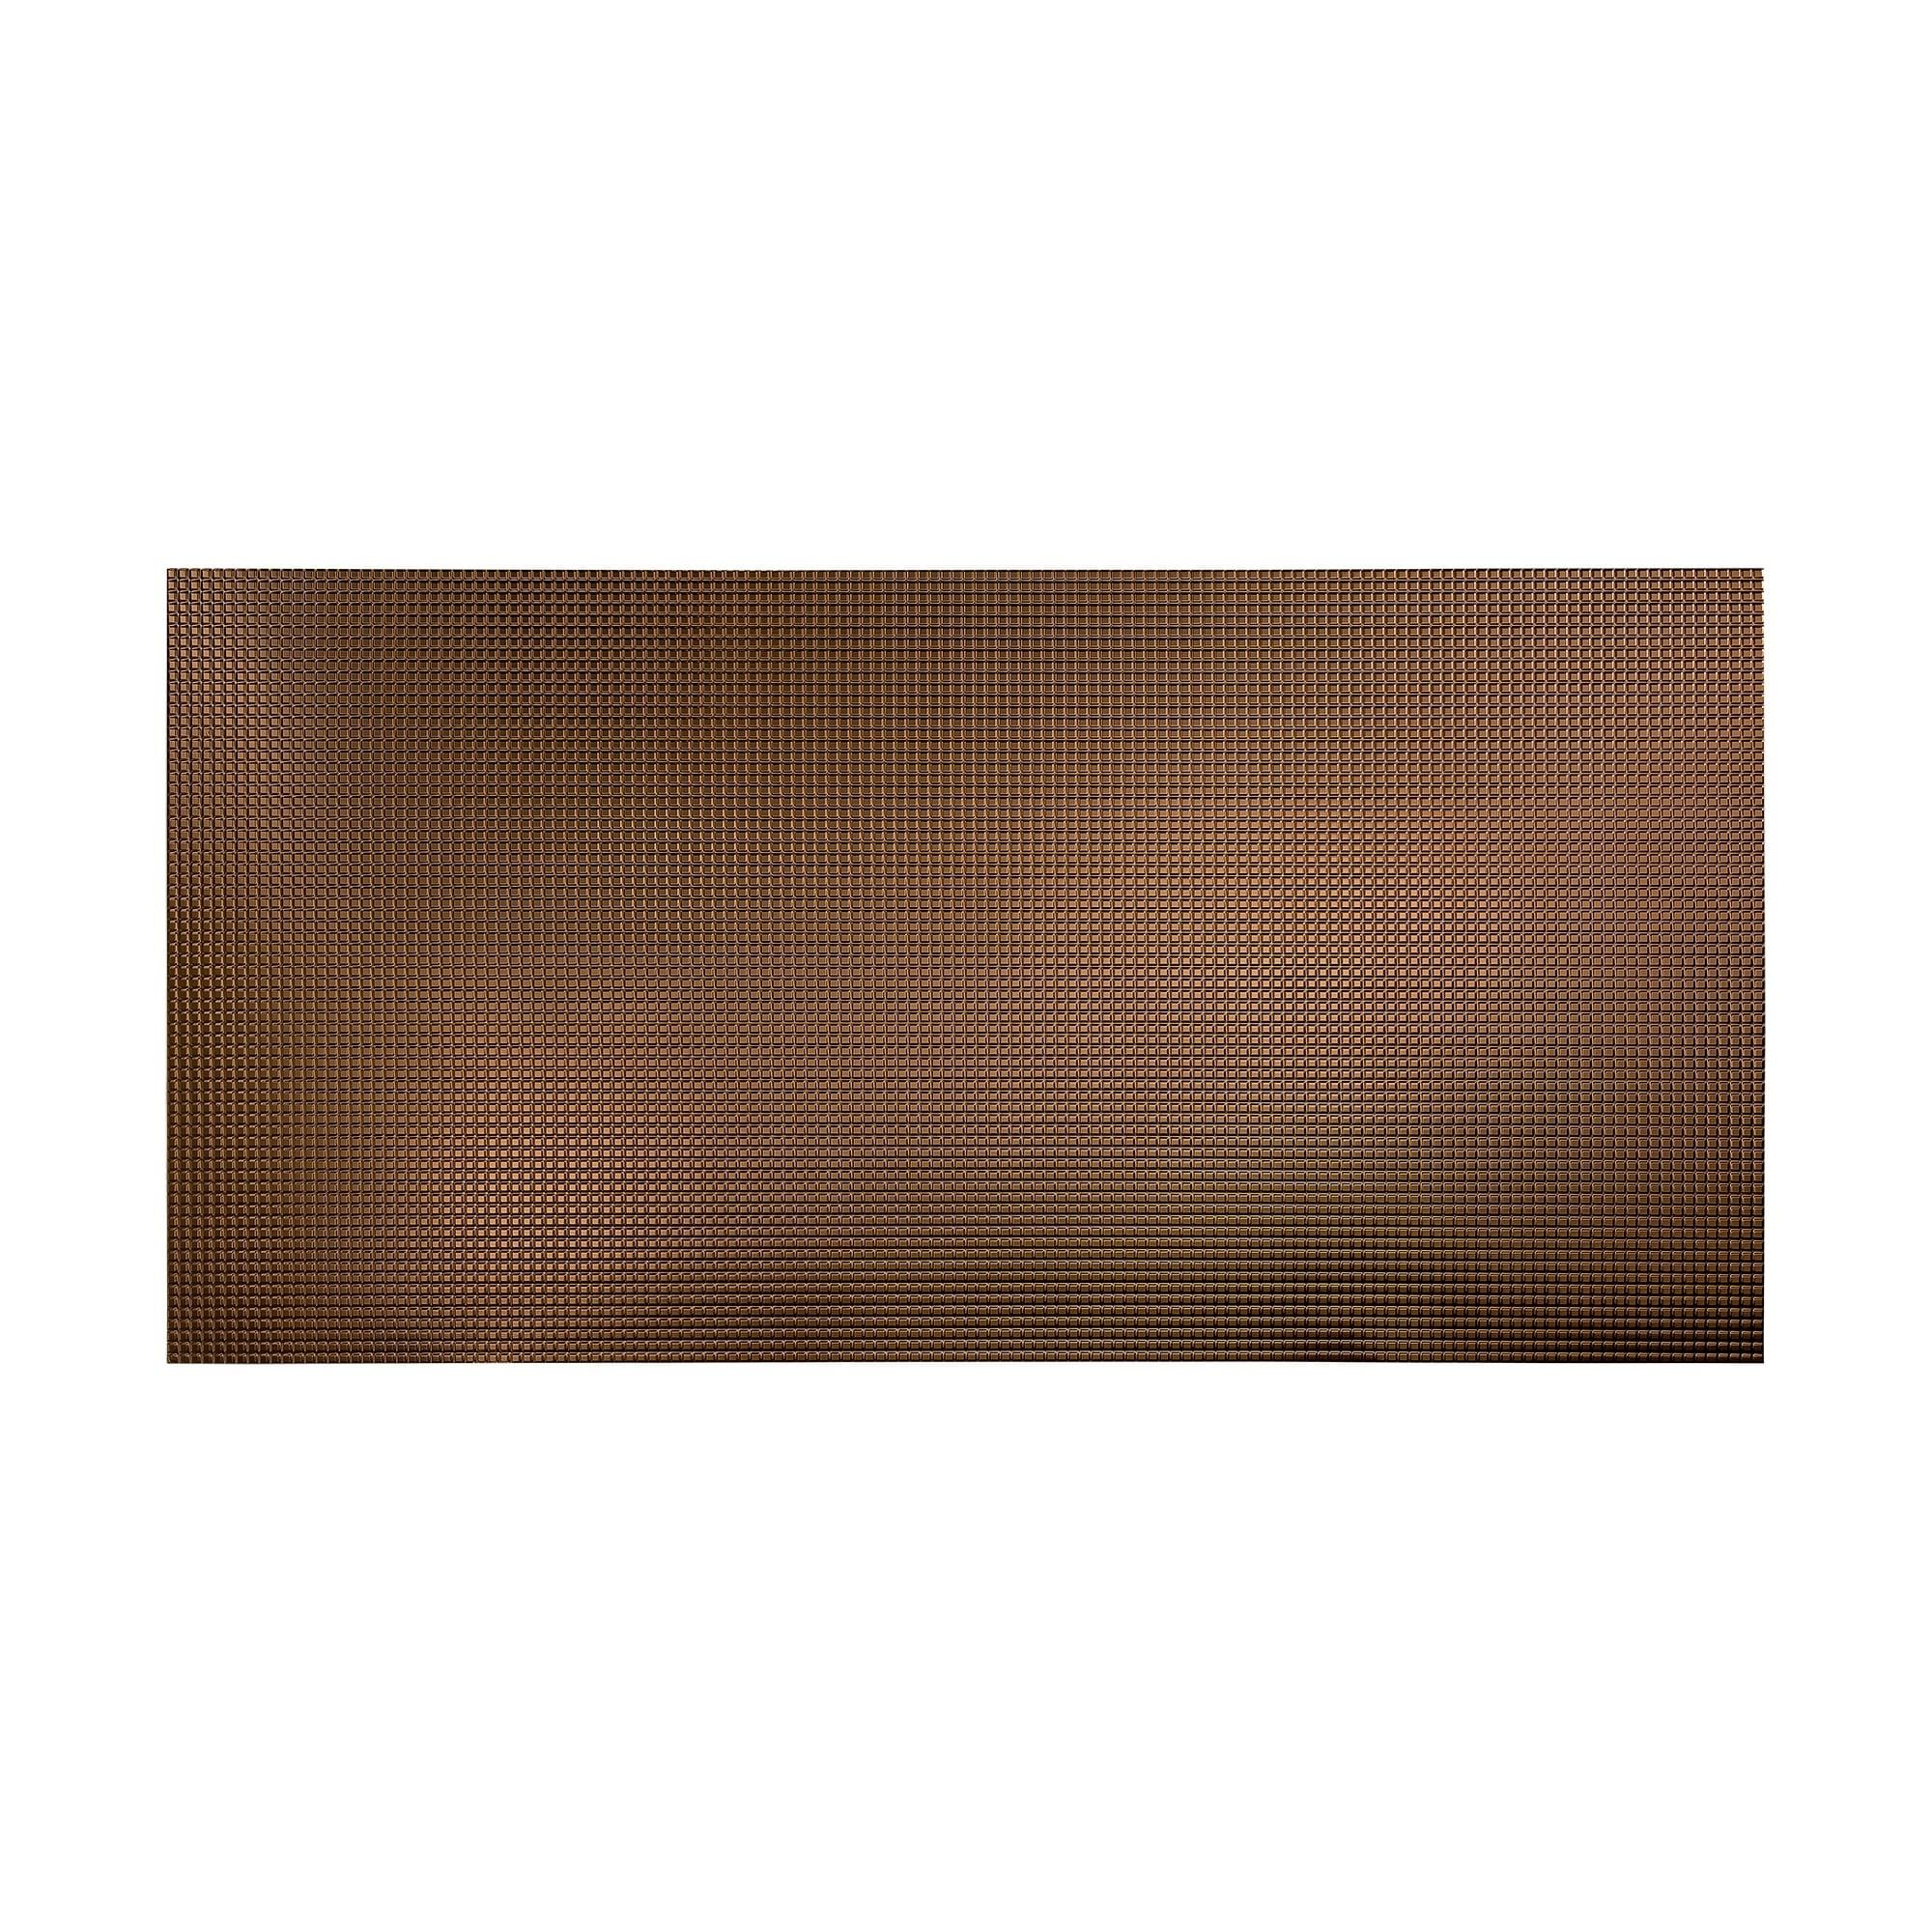 Fasade Diamond Plate Oil-Rubbed Bronze 4-foot x 8-foot Wall Panel  sc 1 st  Pinterest & Fasade Diamond Plate Oil-Rubbed Bronze 4-foot x 8-foot Wall Panel ...